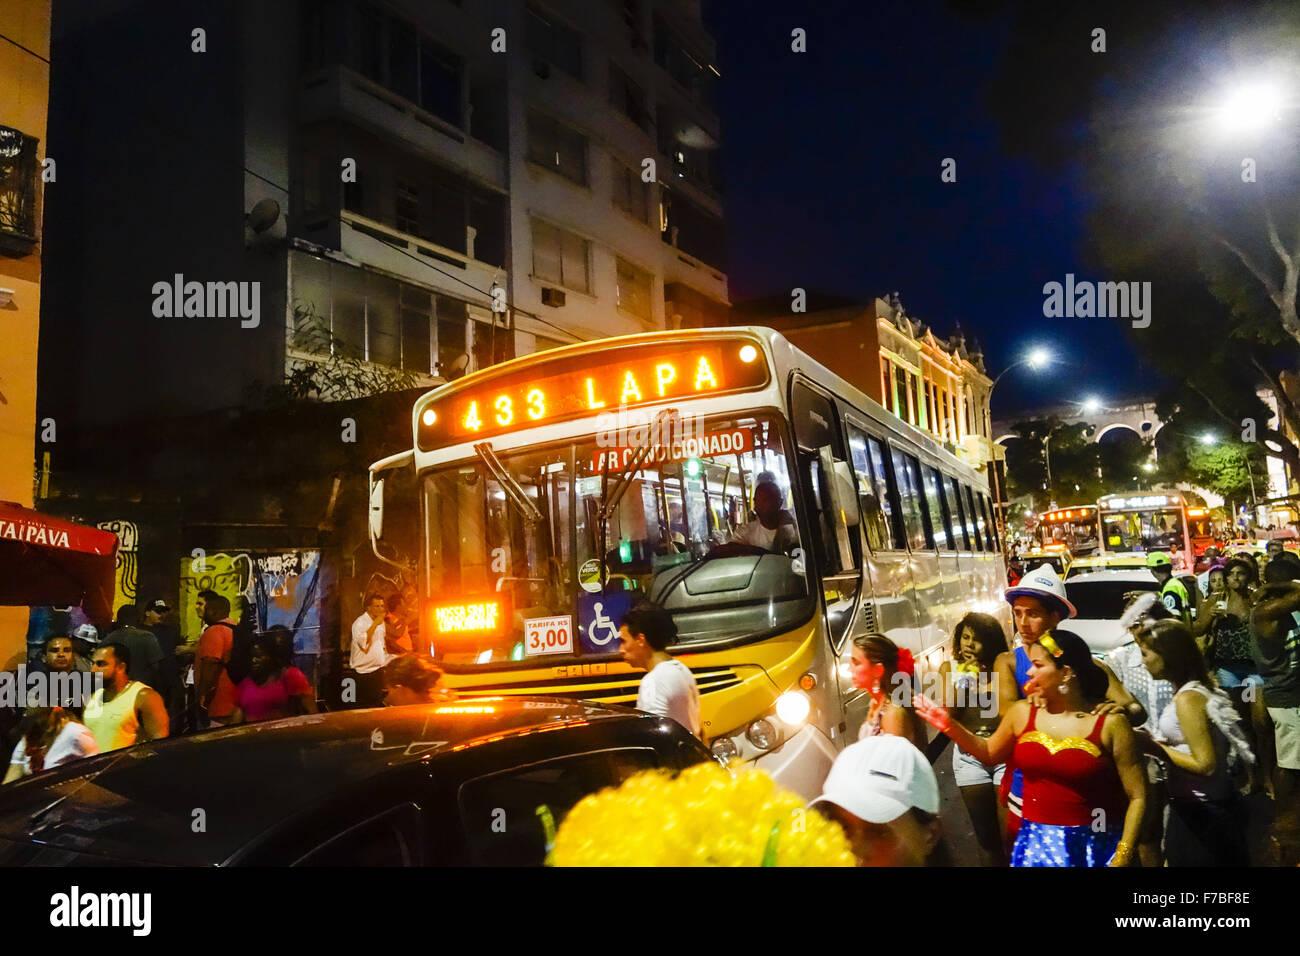 Rio de Janeiro, Lapa, street carnival, Brazil - Stock Image